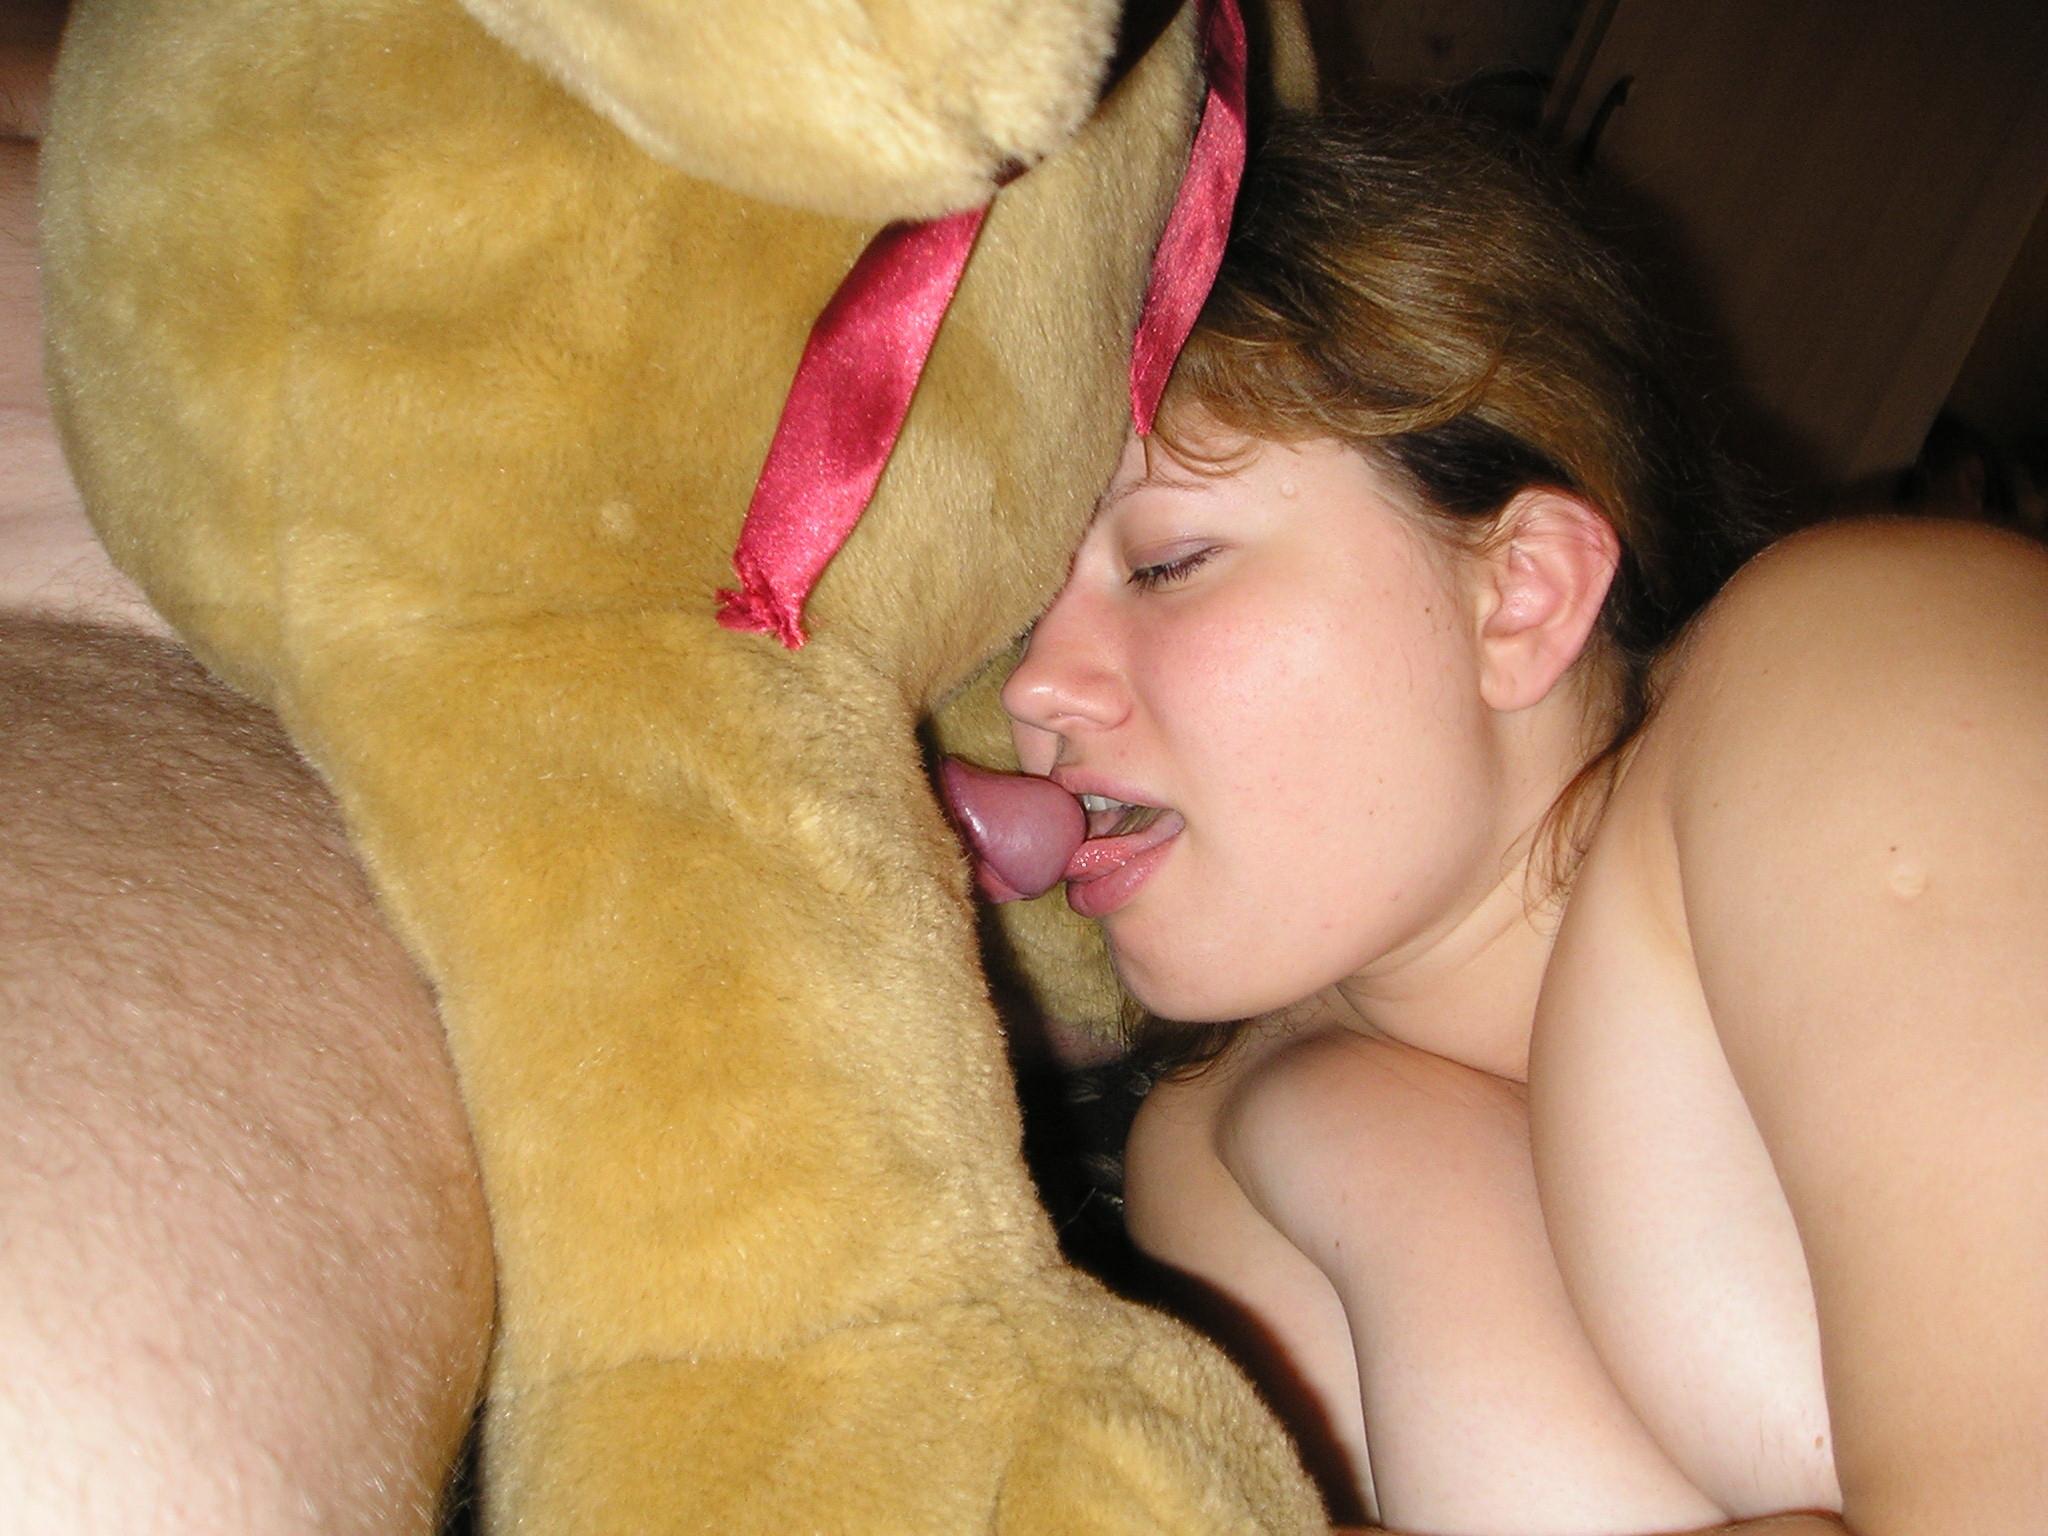 Фото секса медведем 15 фотография